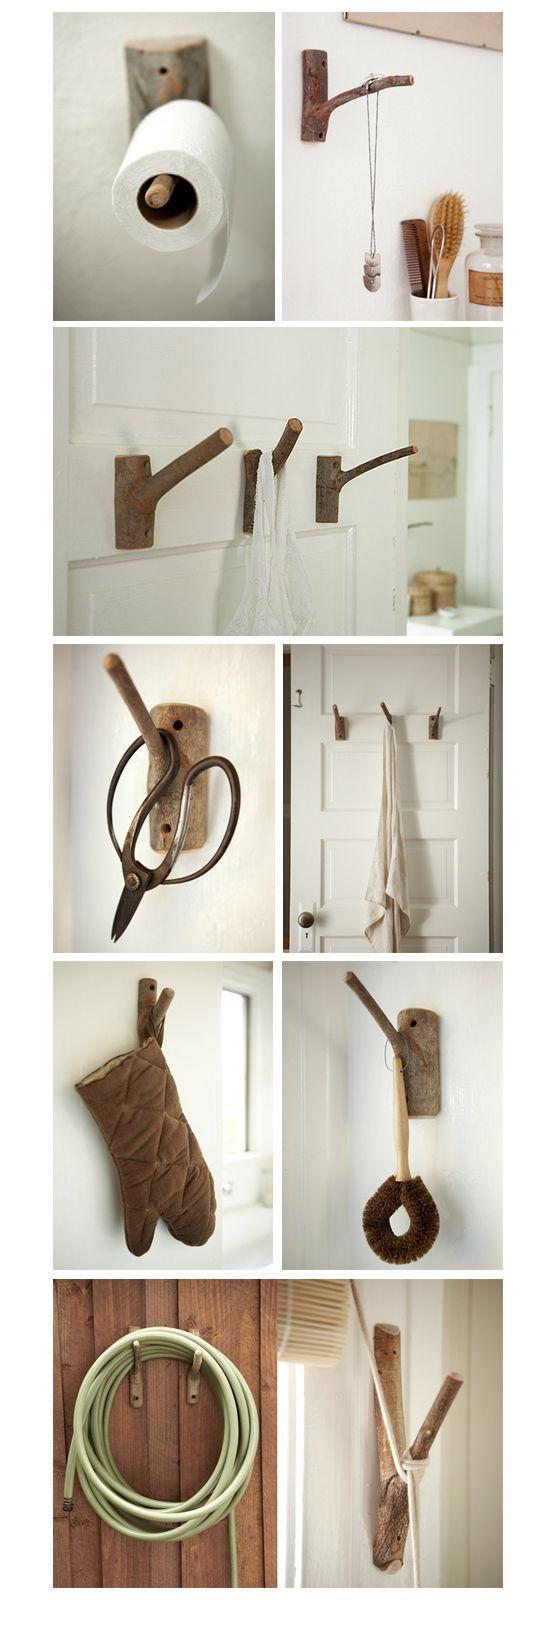 Fabriquer vos propres crochets